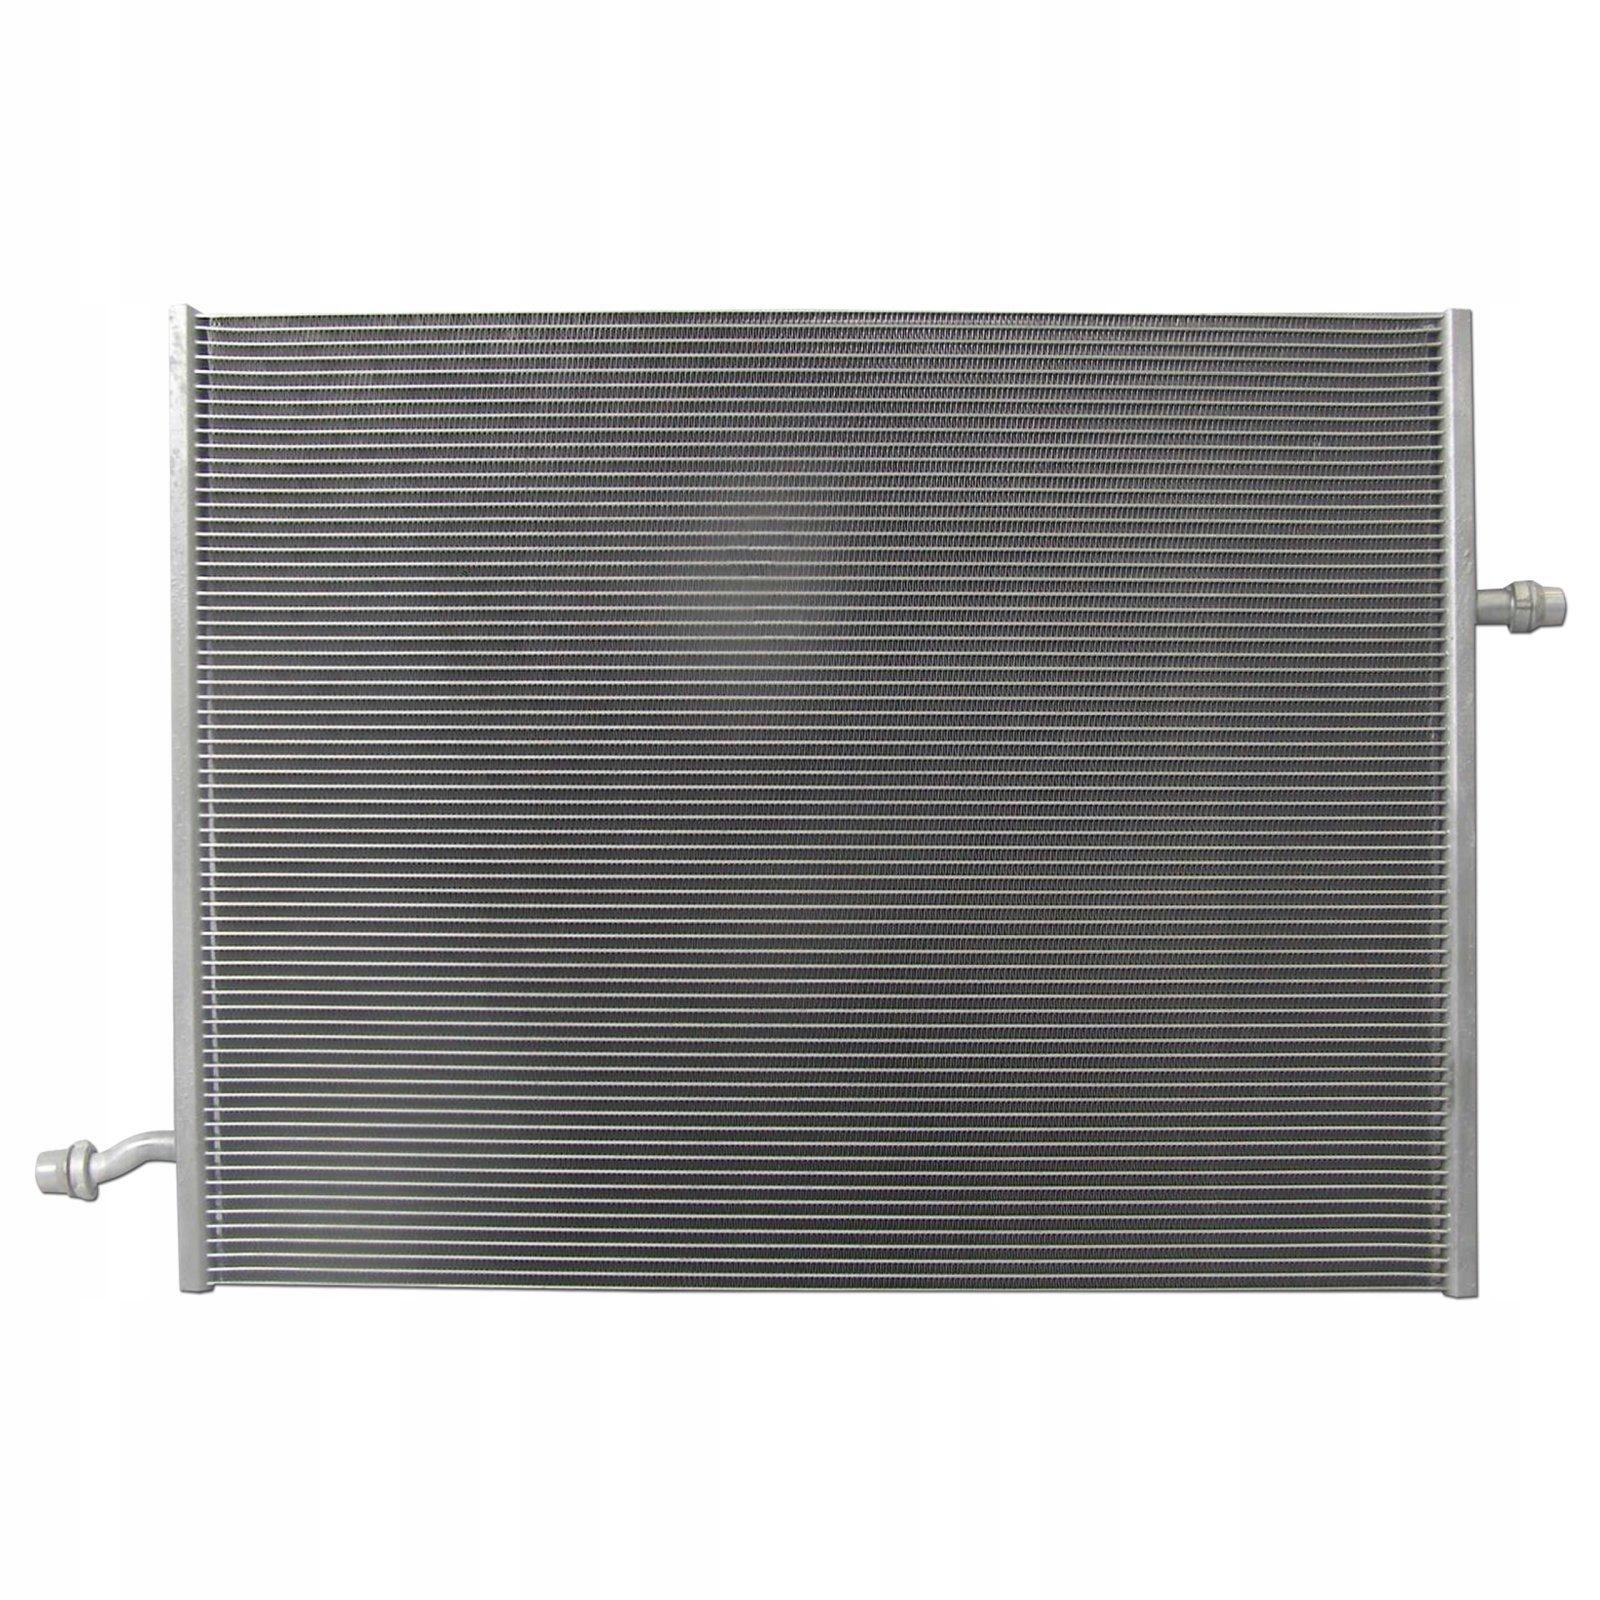 MERCEDES BENZ 63 AMG Water Cooler Radiator OEM A0995003203